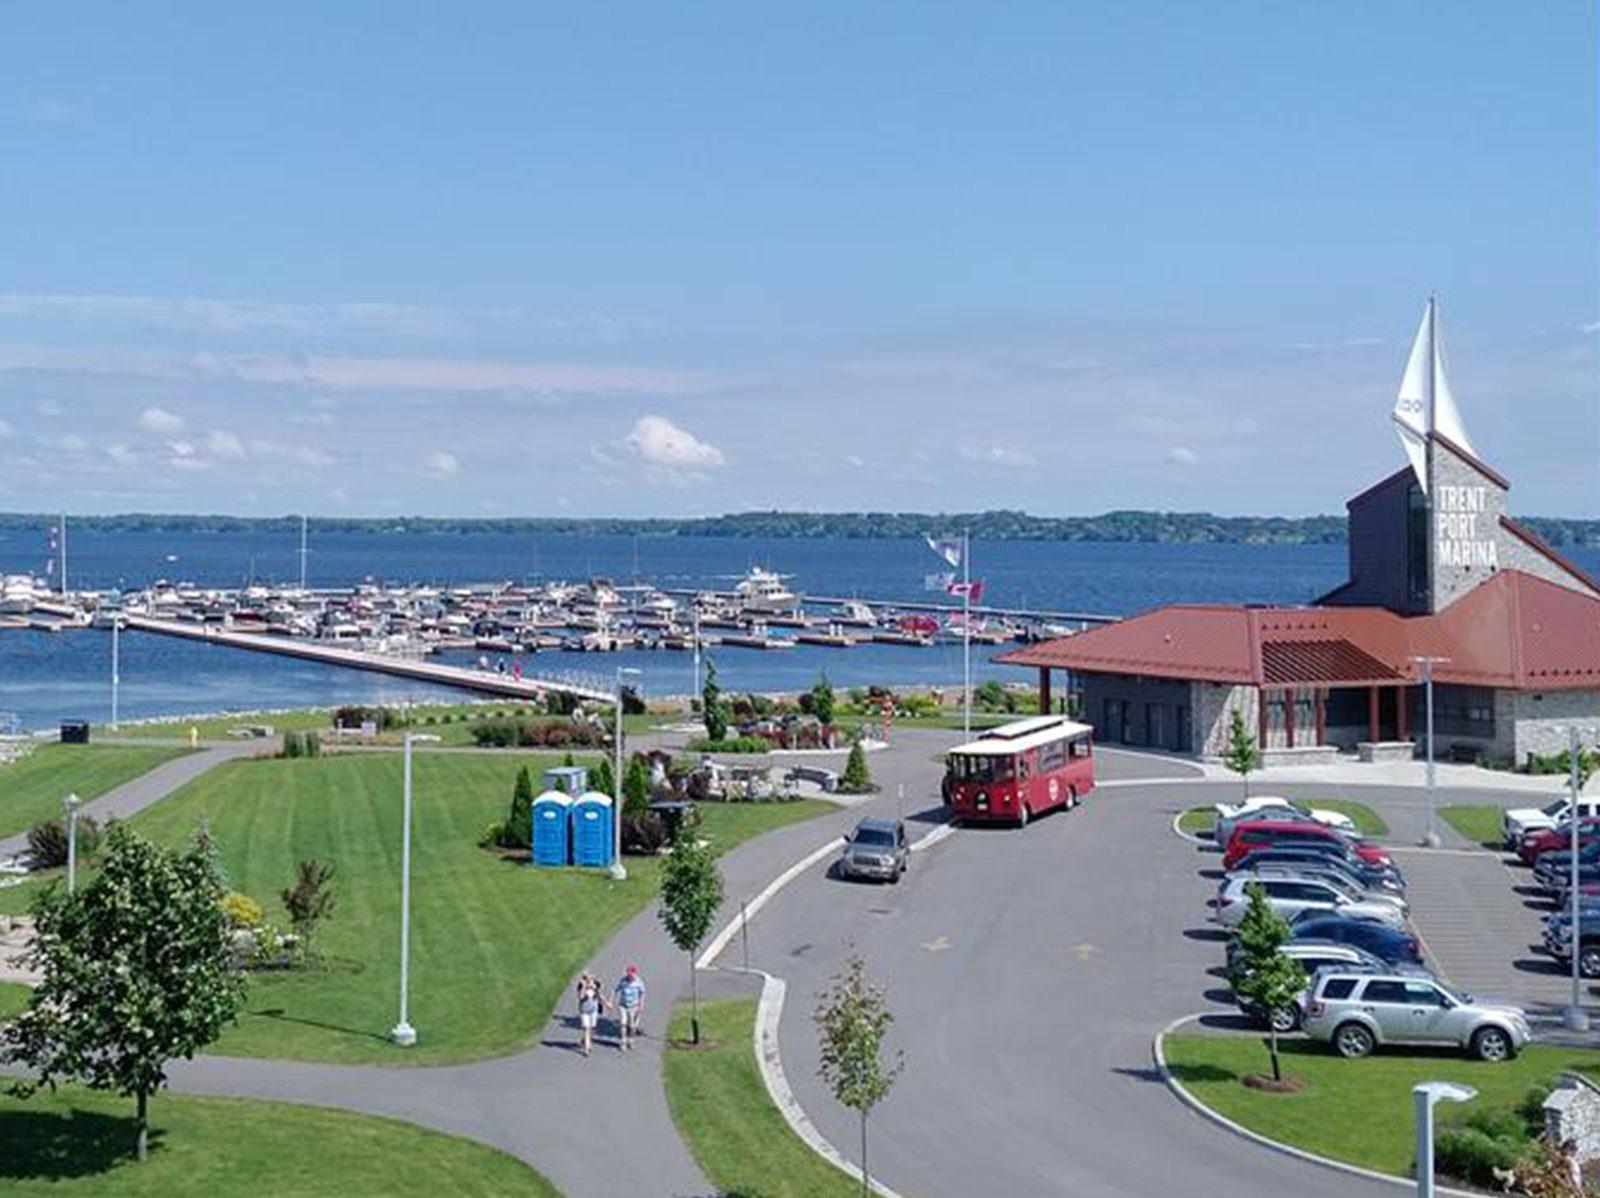 trent-port-marina-photo.jpg_0013_636437903716065525_Final